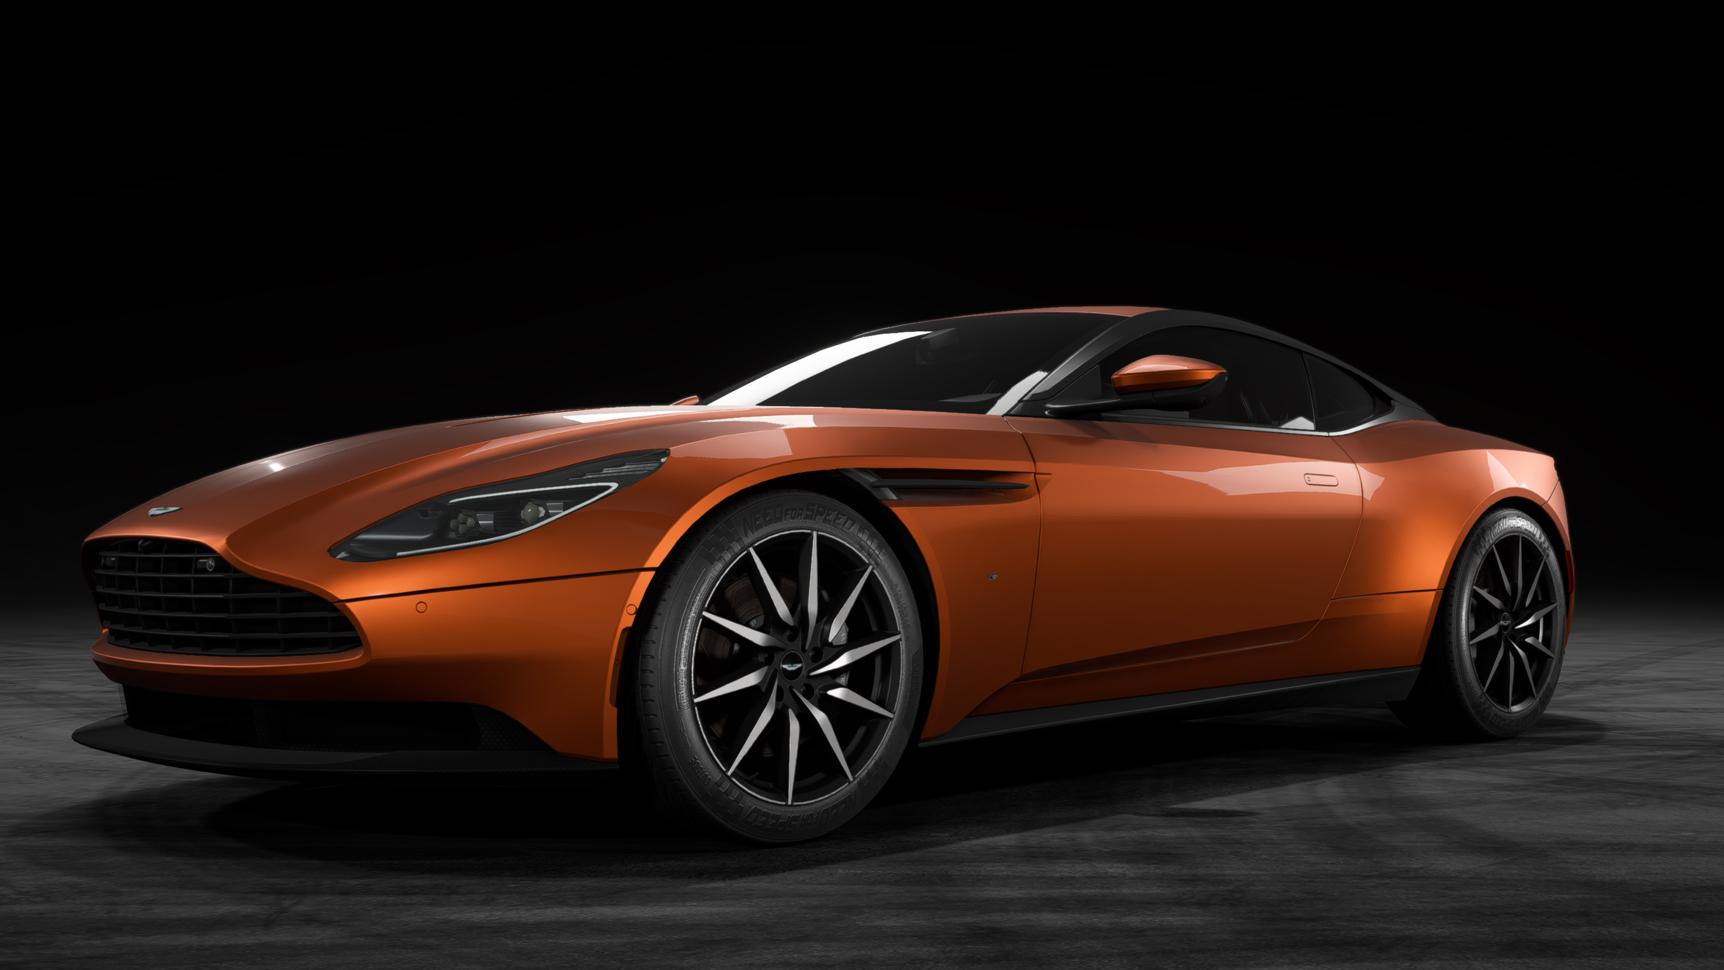 Aston Martin Db11 Need For Speed Wiki Fandom